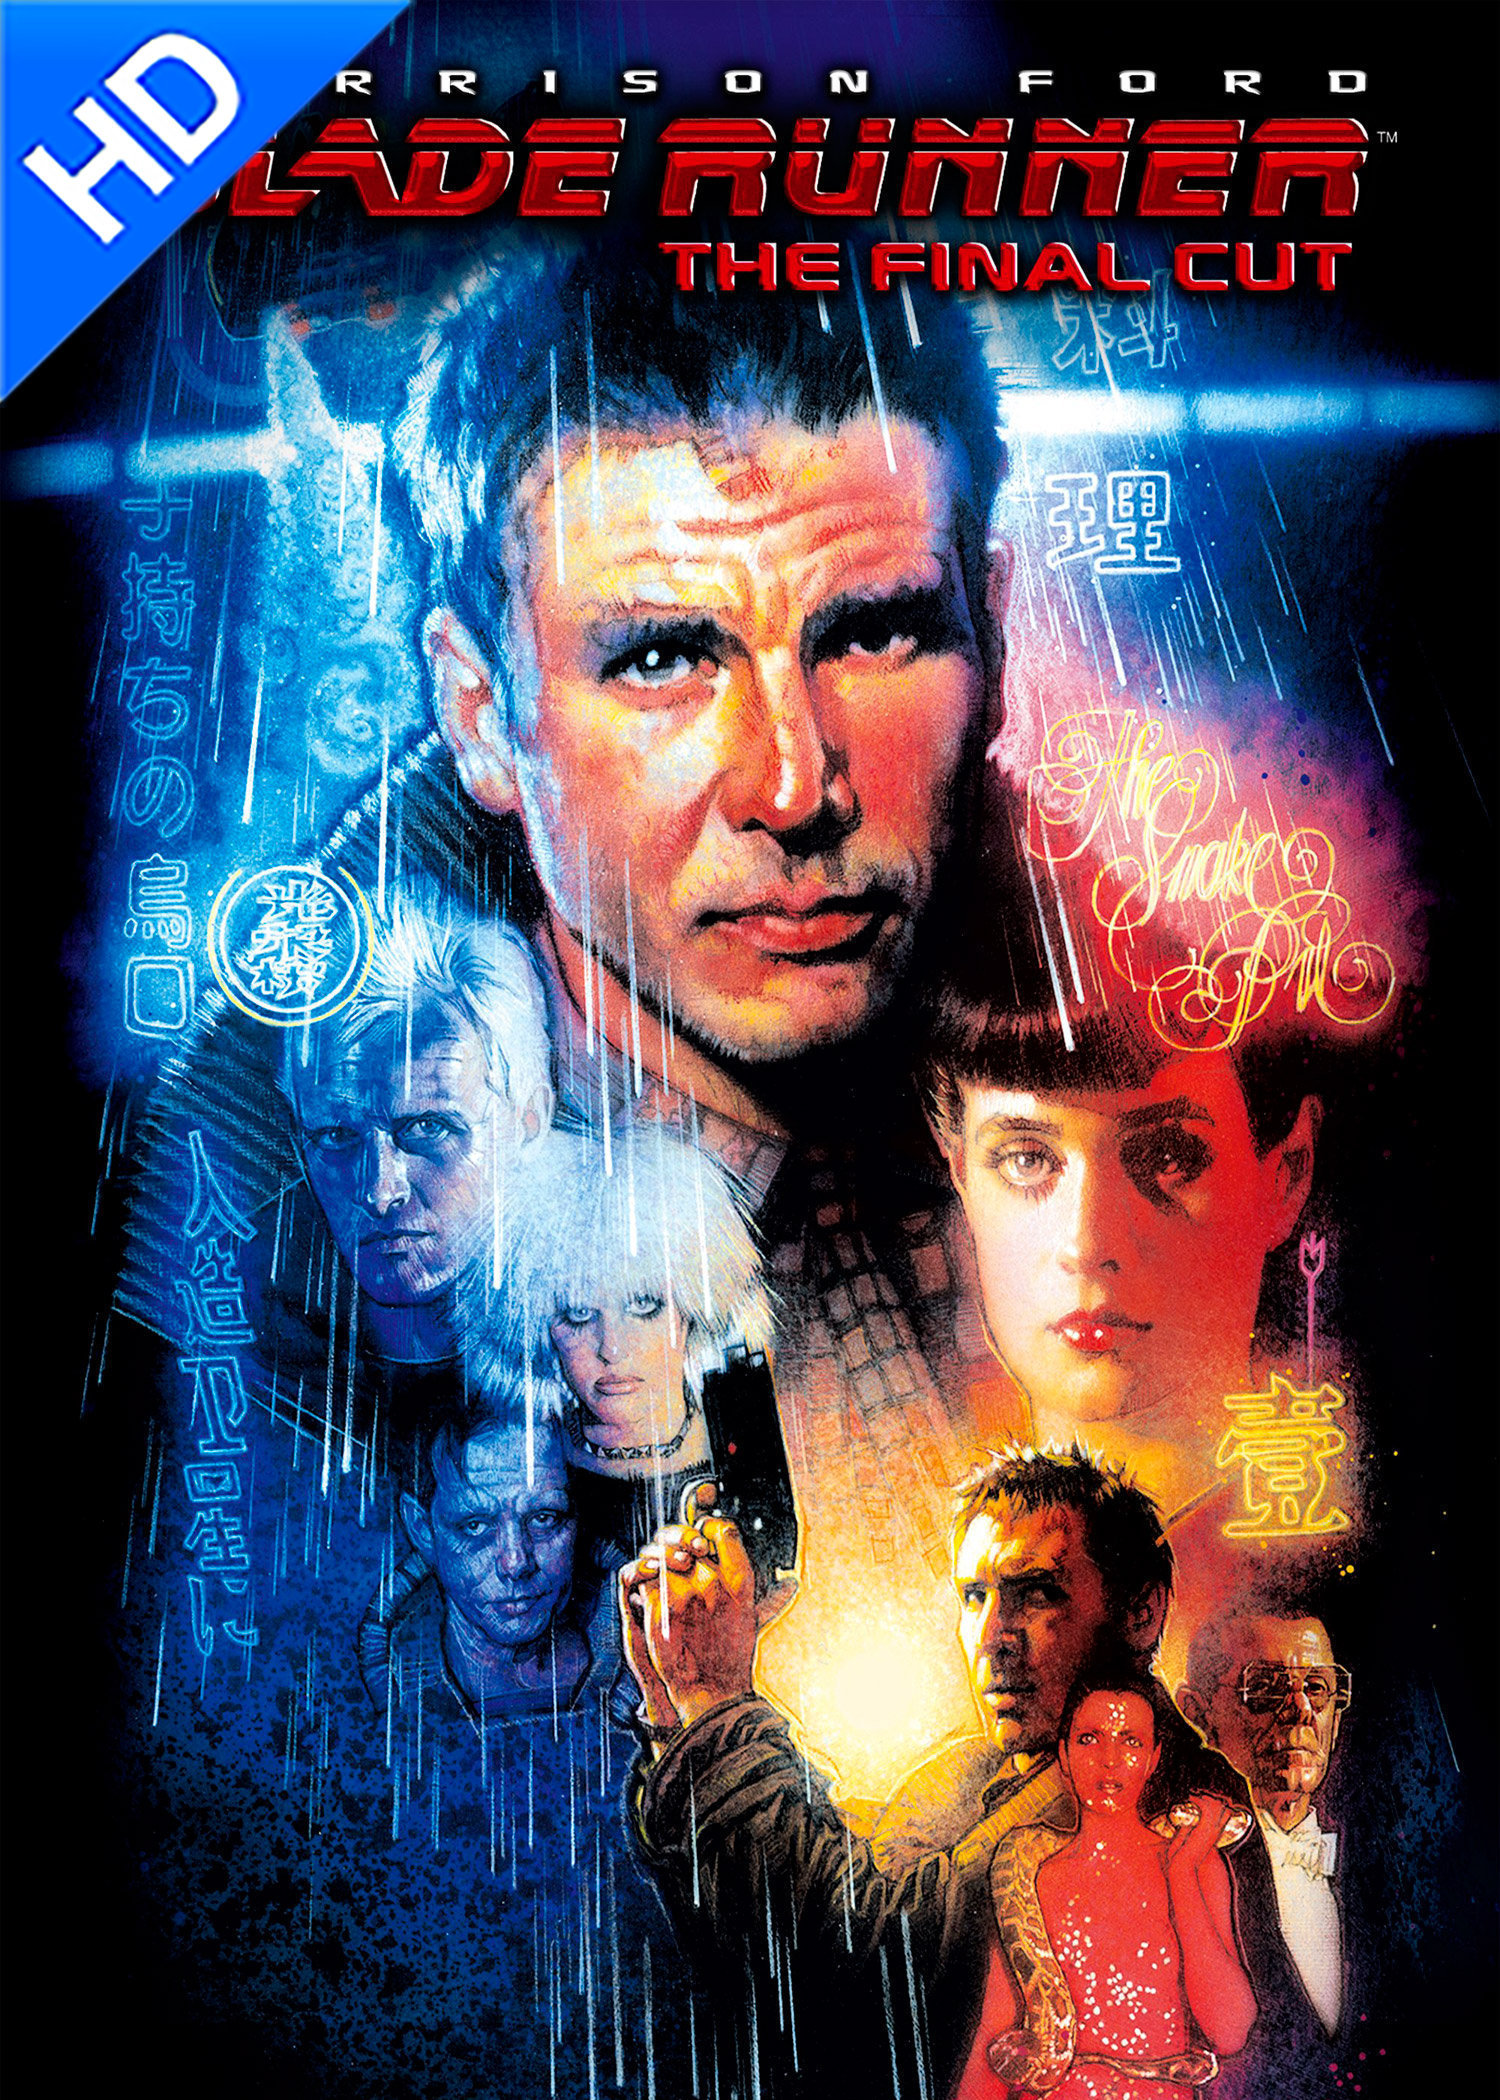 Image of Blade Runner - Director's Cut